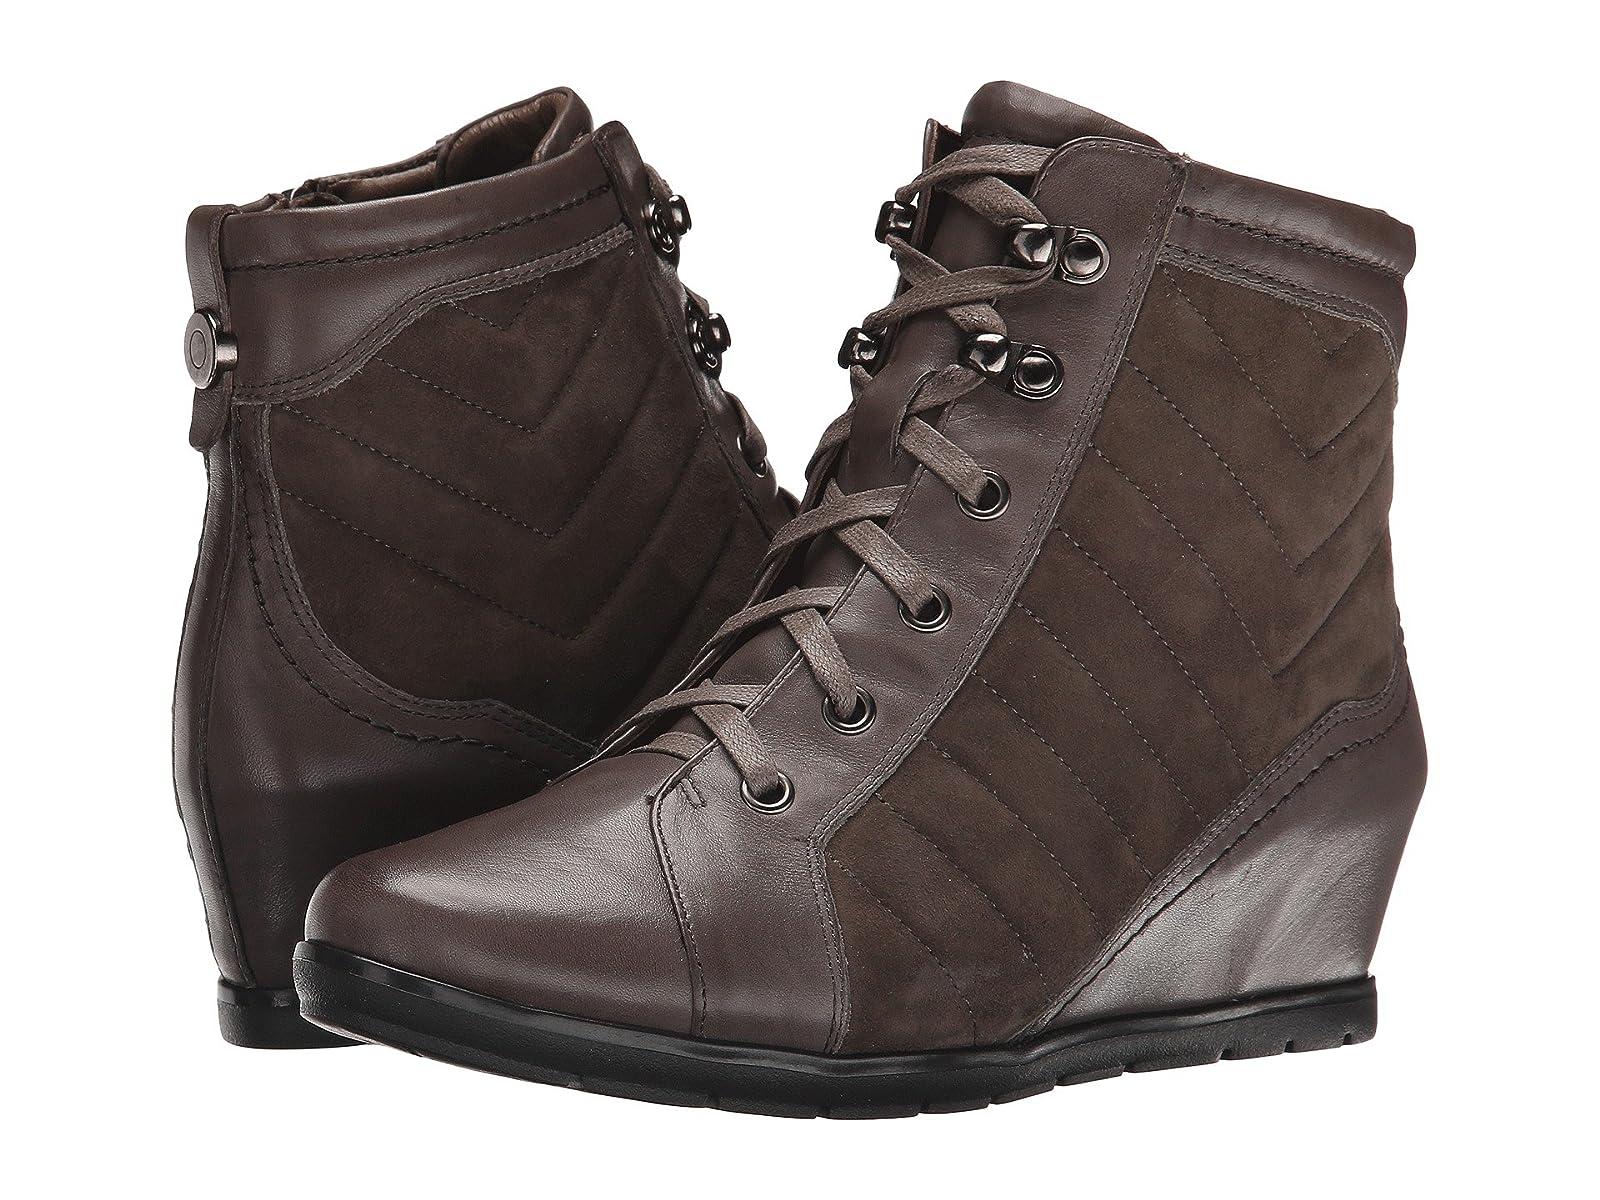 Earth Limburg EarthiesCheap and distinctive eye-catching shoes